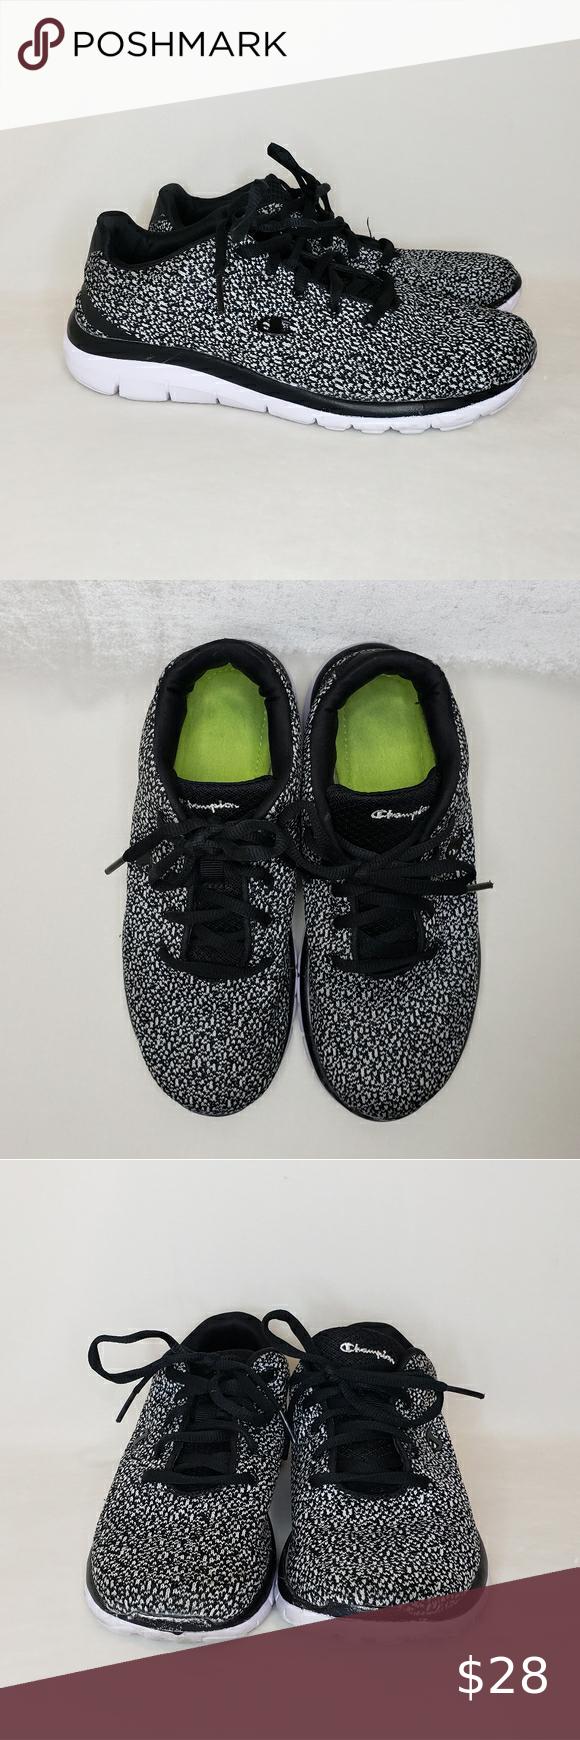 Champion Gusto XT II Sneakers Size 6.5